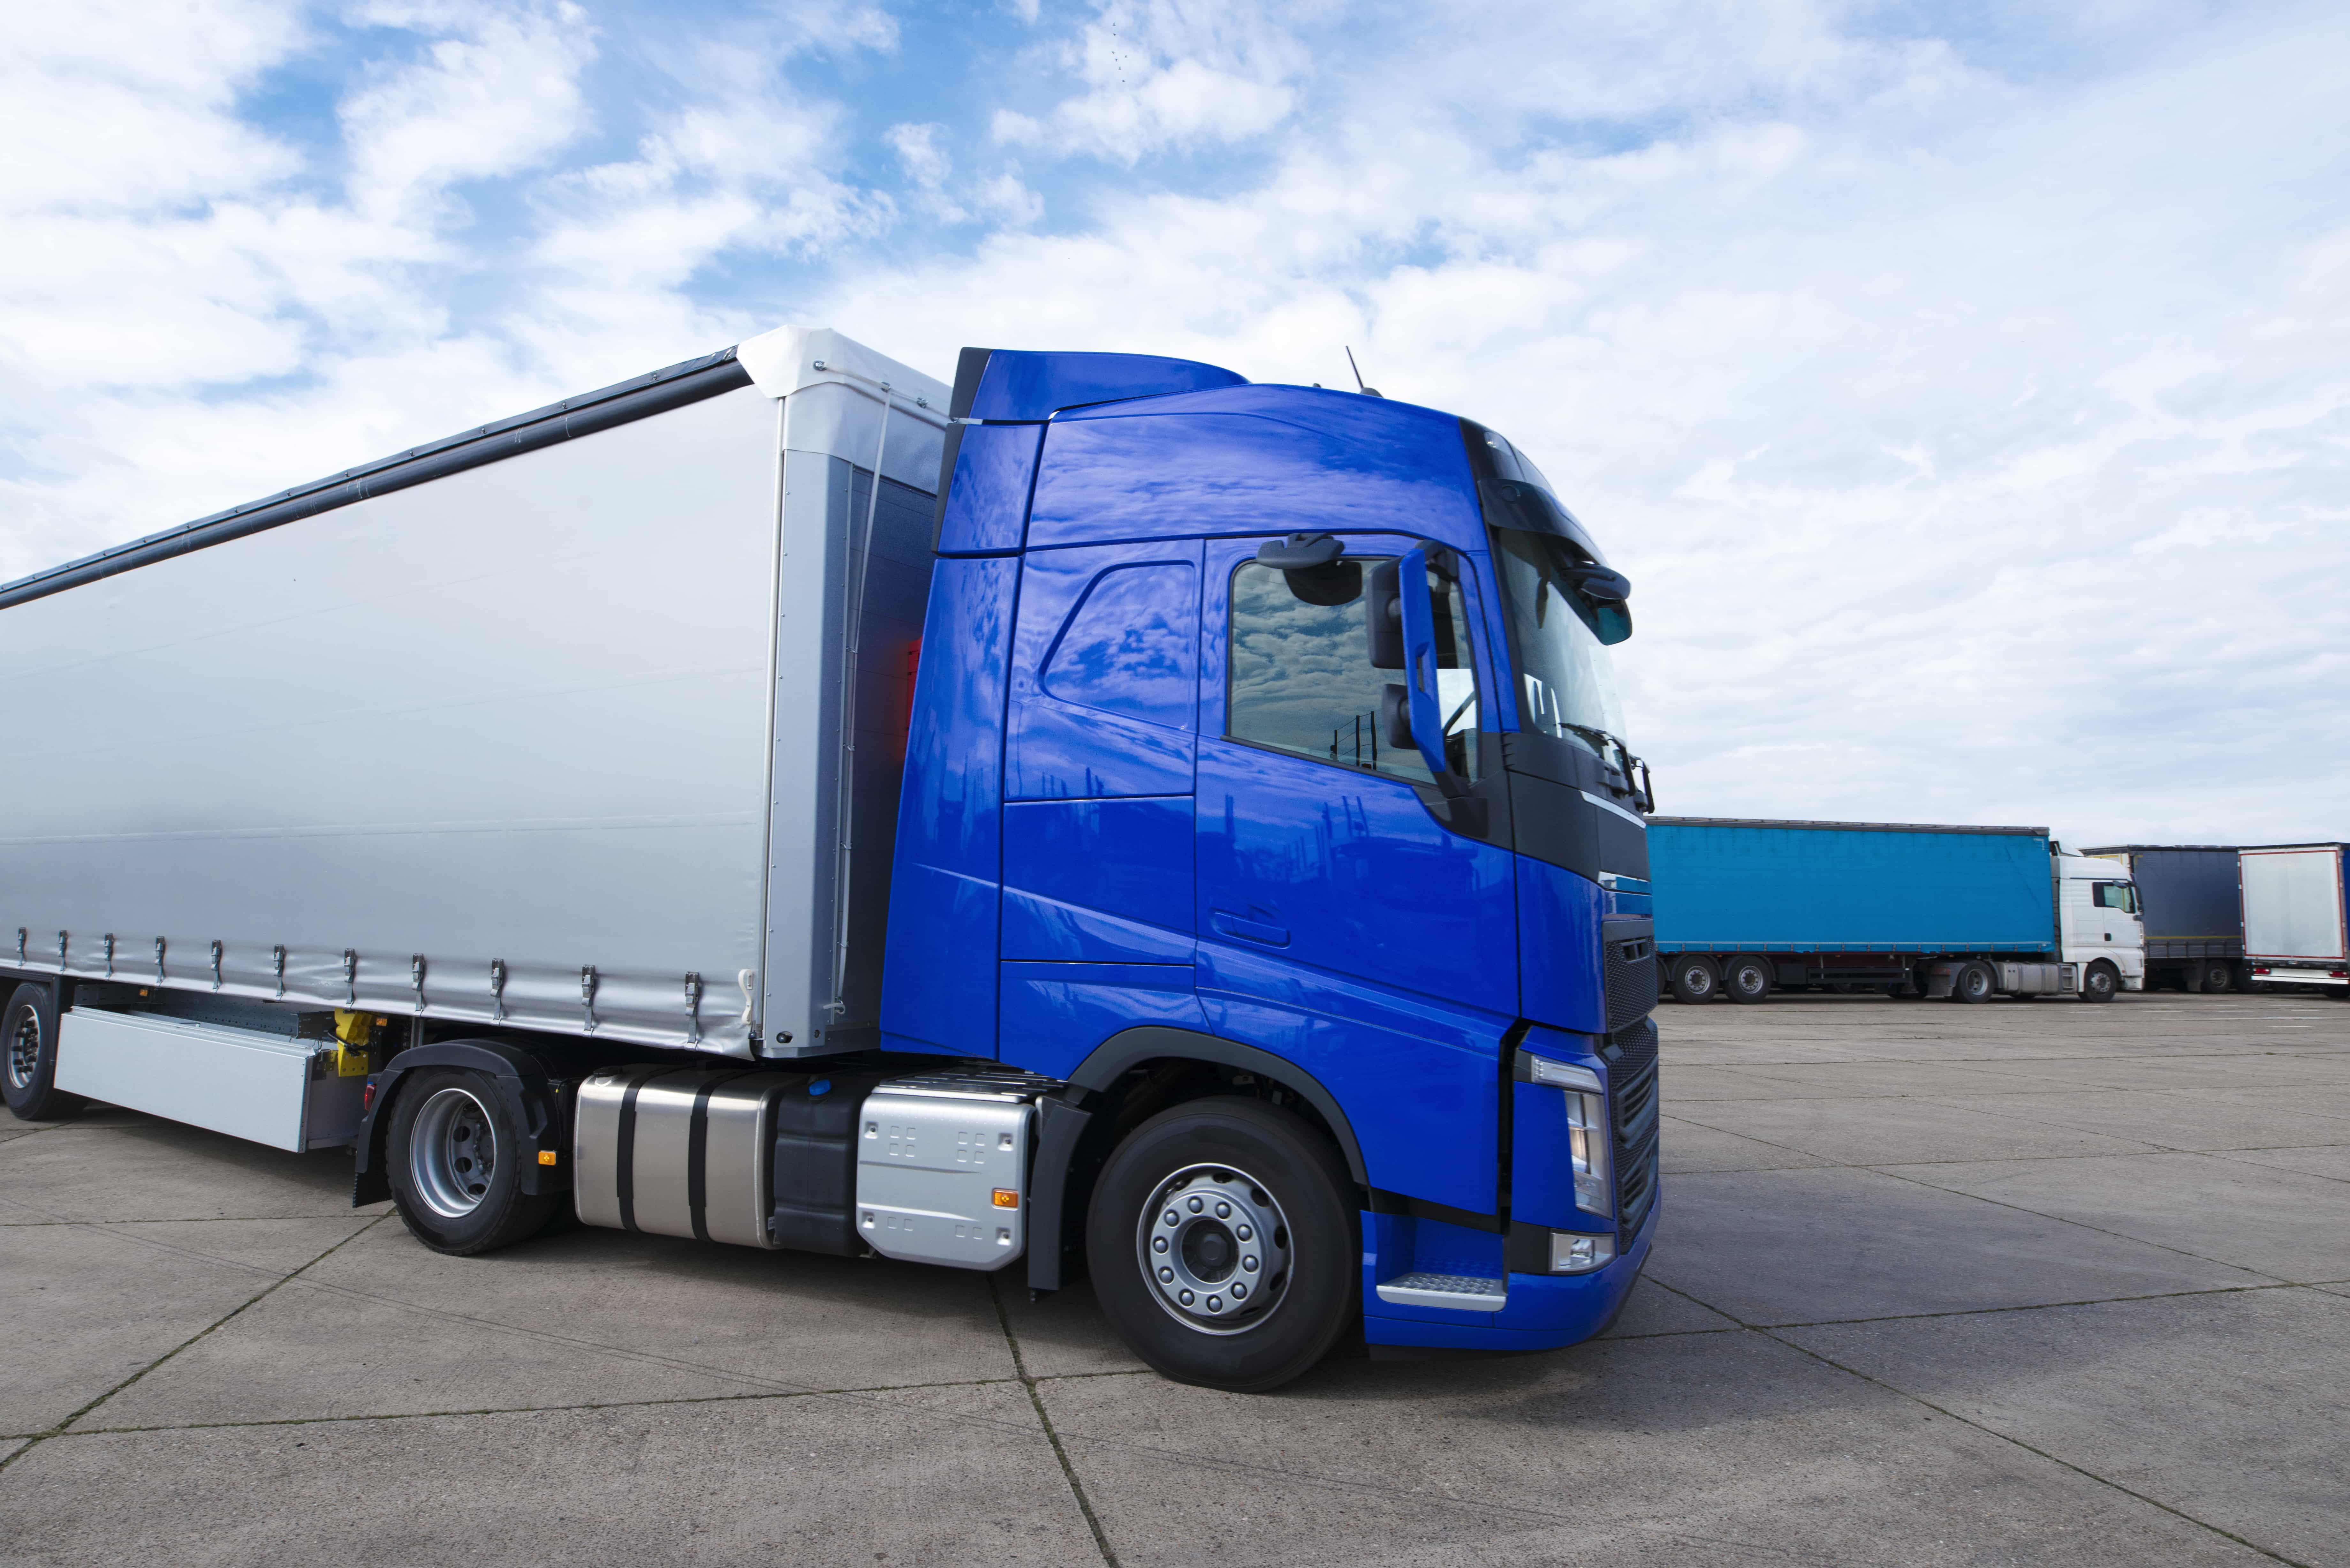 Truck long vehicle